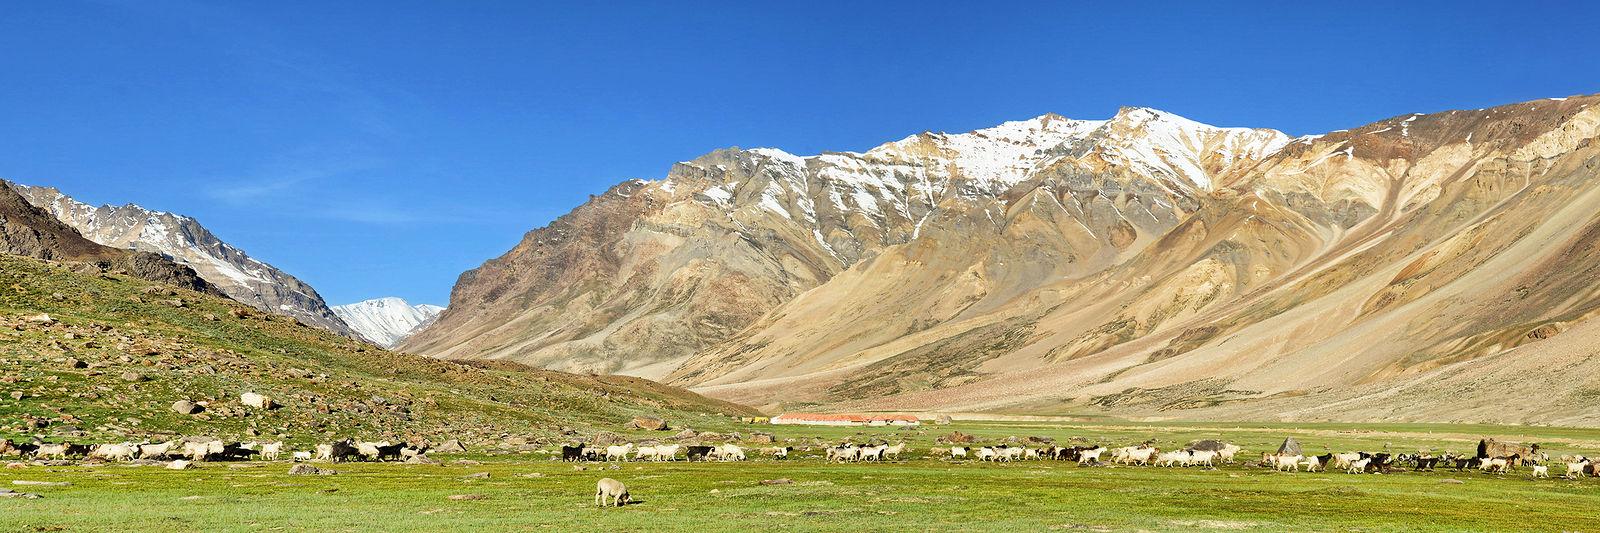 Ivan Aleshin. NH21 and other Himalayan Roads. 0009